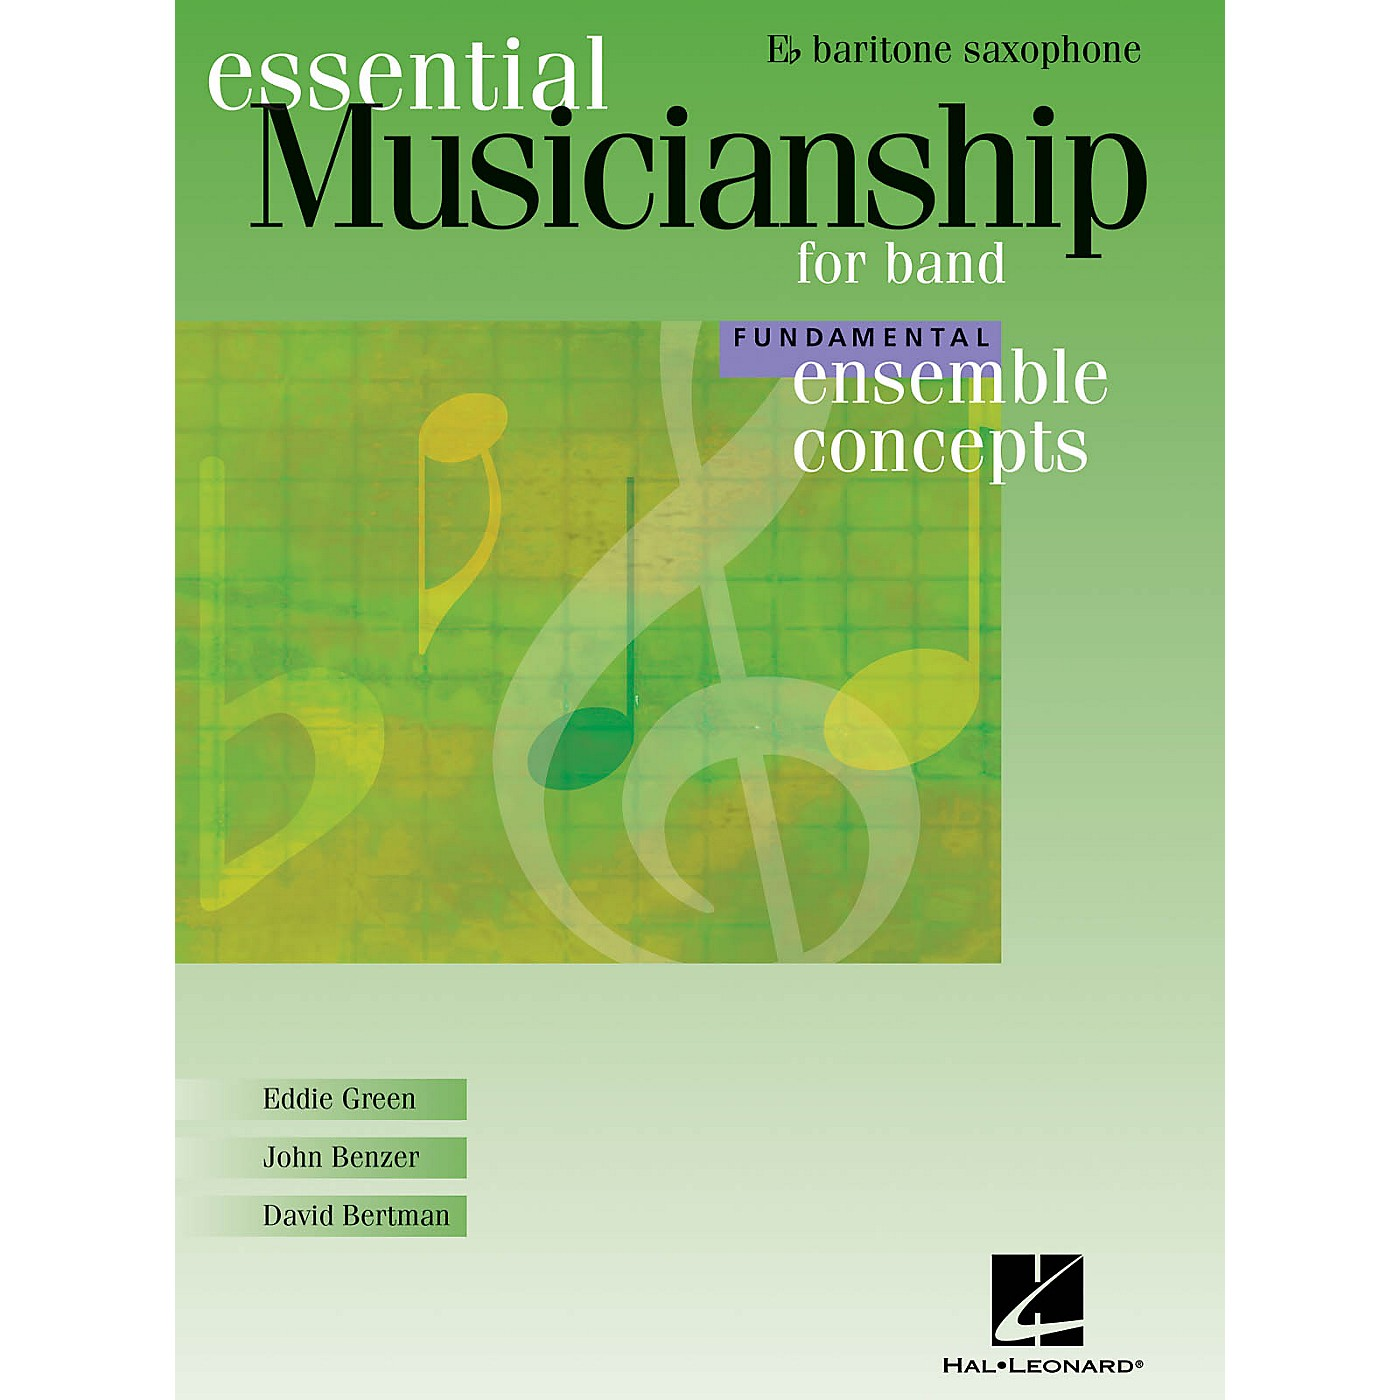 Hal Leonard Essential Musicianship for Band - Ensemble Concepts Concert Band thumbnail